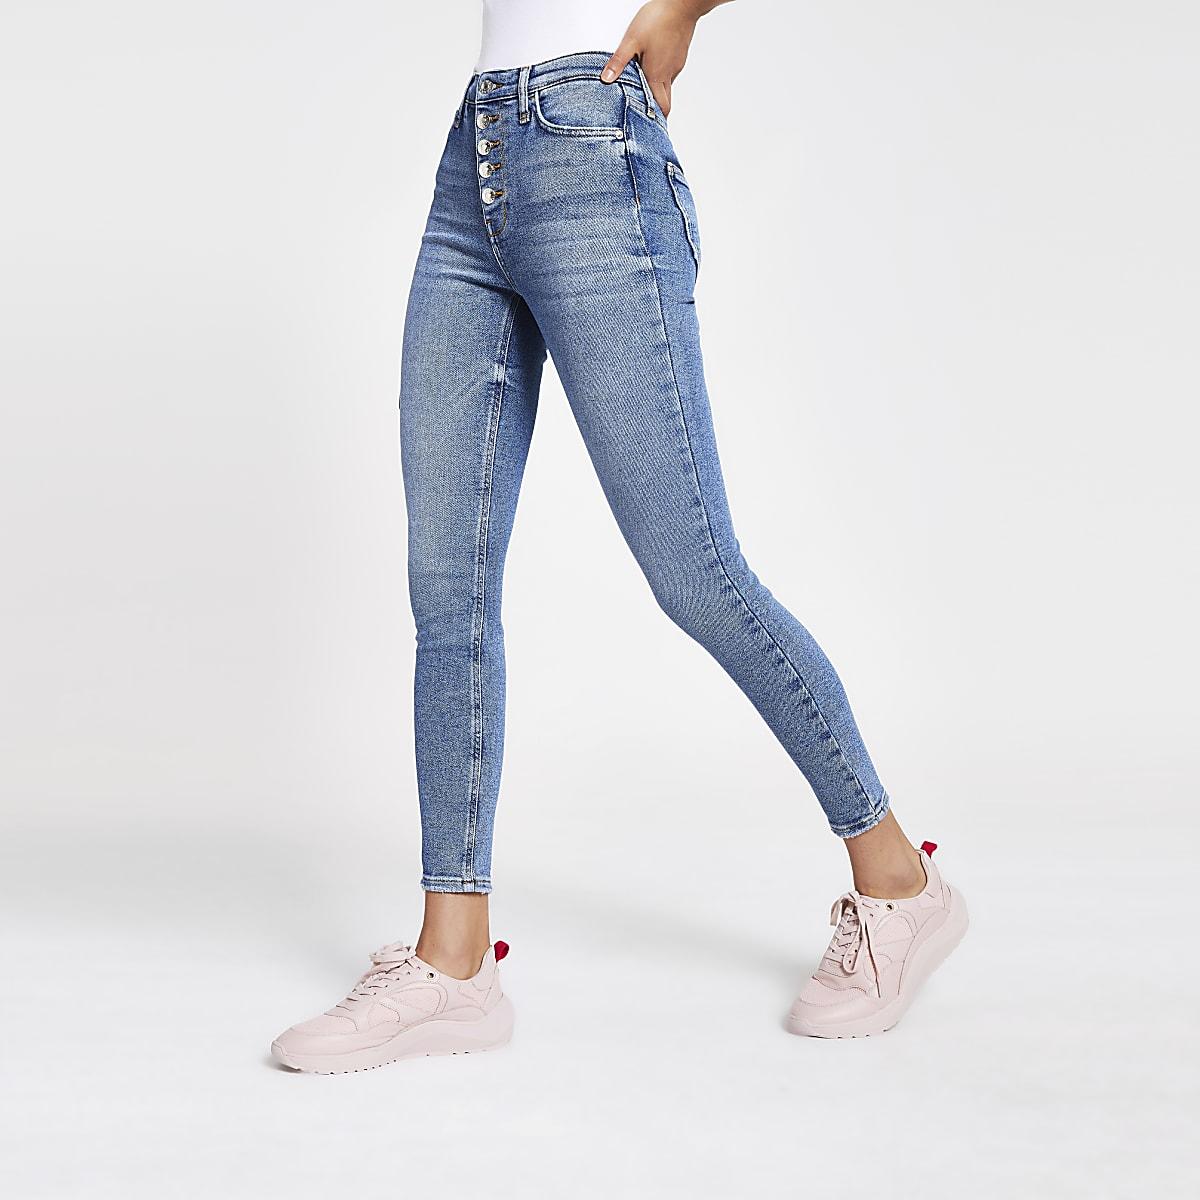 Hailey - Middenblauwe jeans met hoge taille